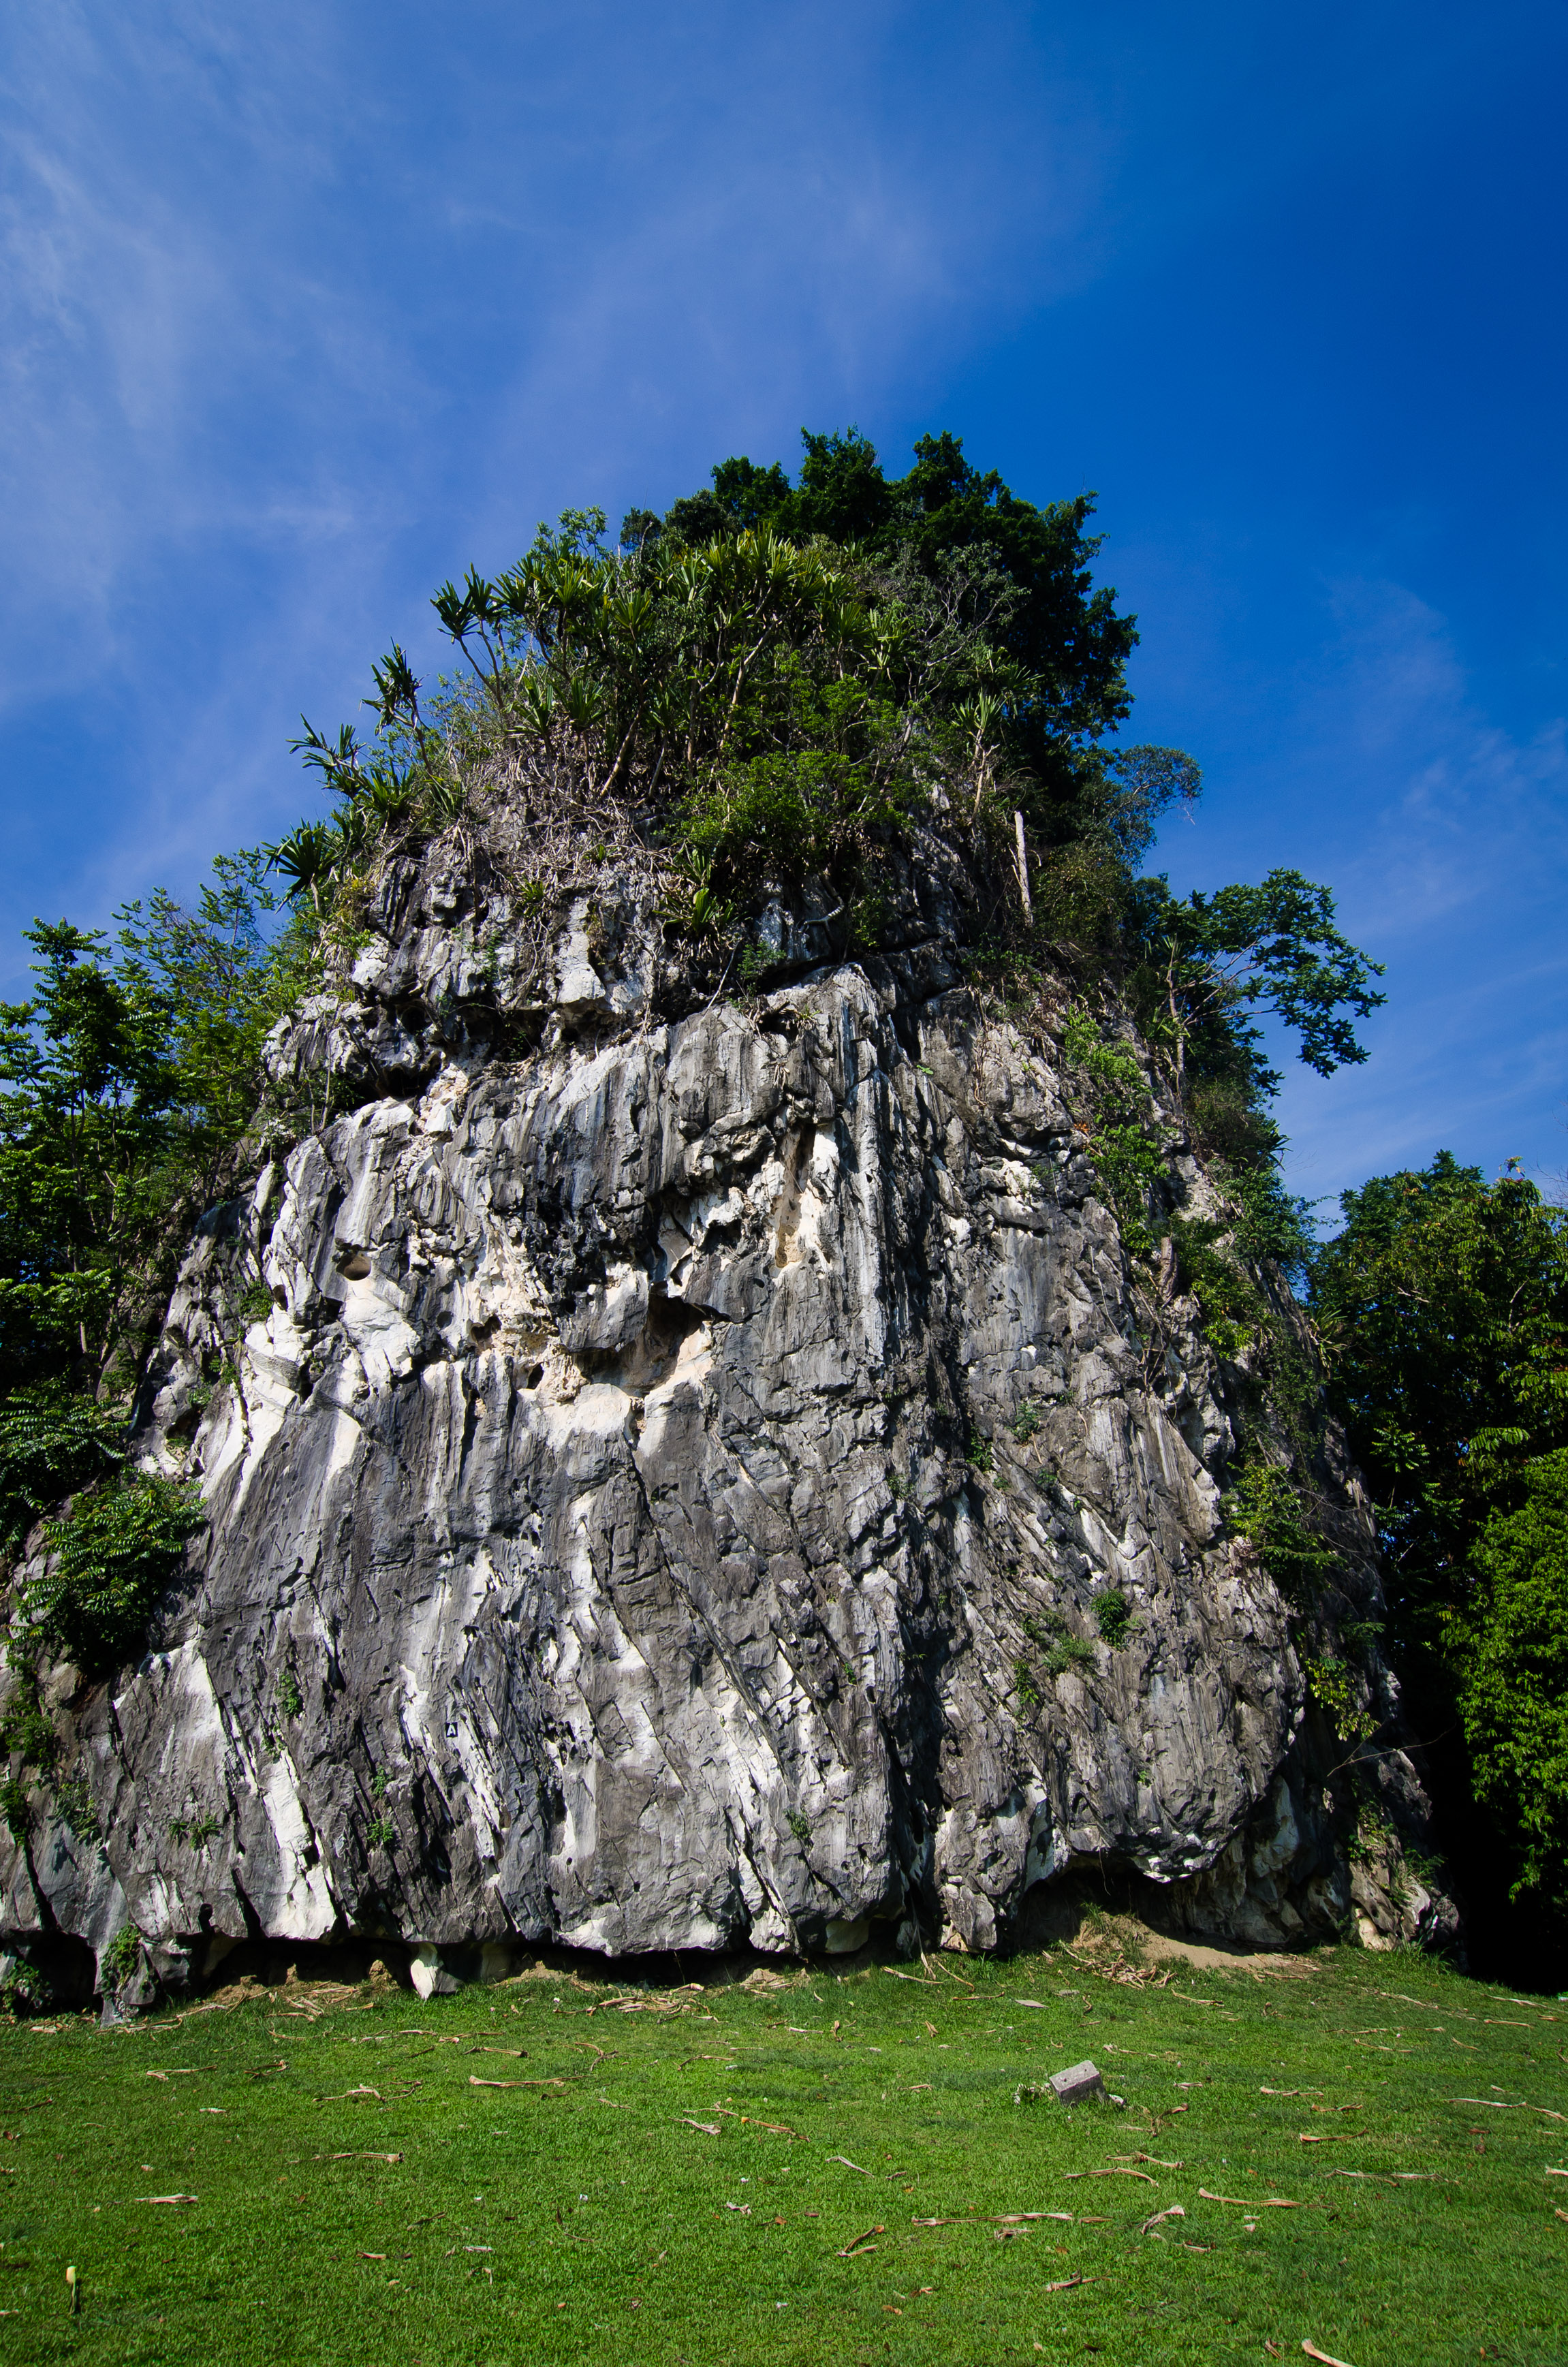 Gua Musang Taman Etnobotani